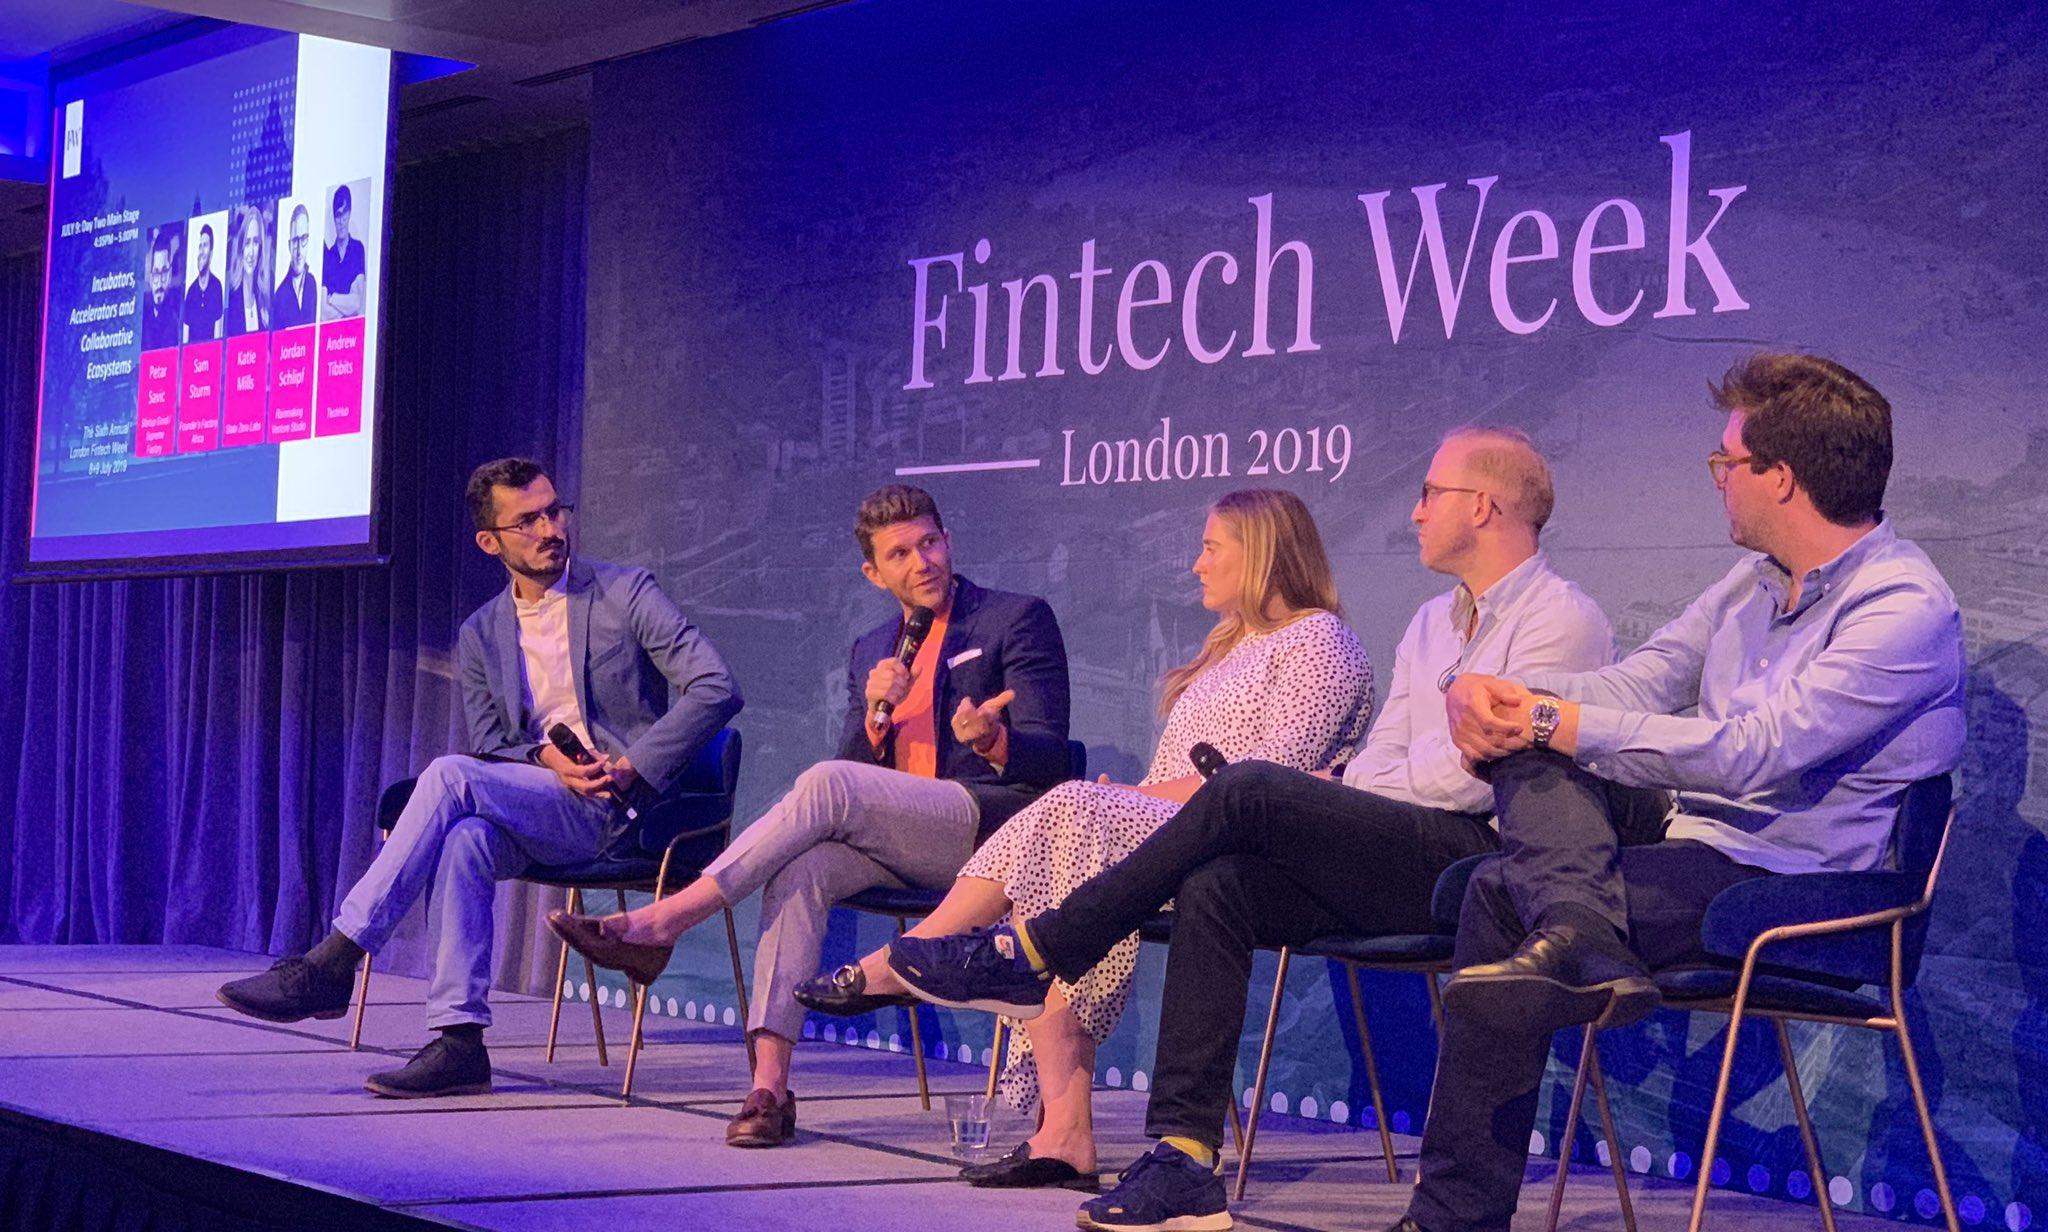 London Fintech Week - Incubators, Accelerators and Collaborative Ecosystems